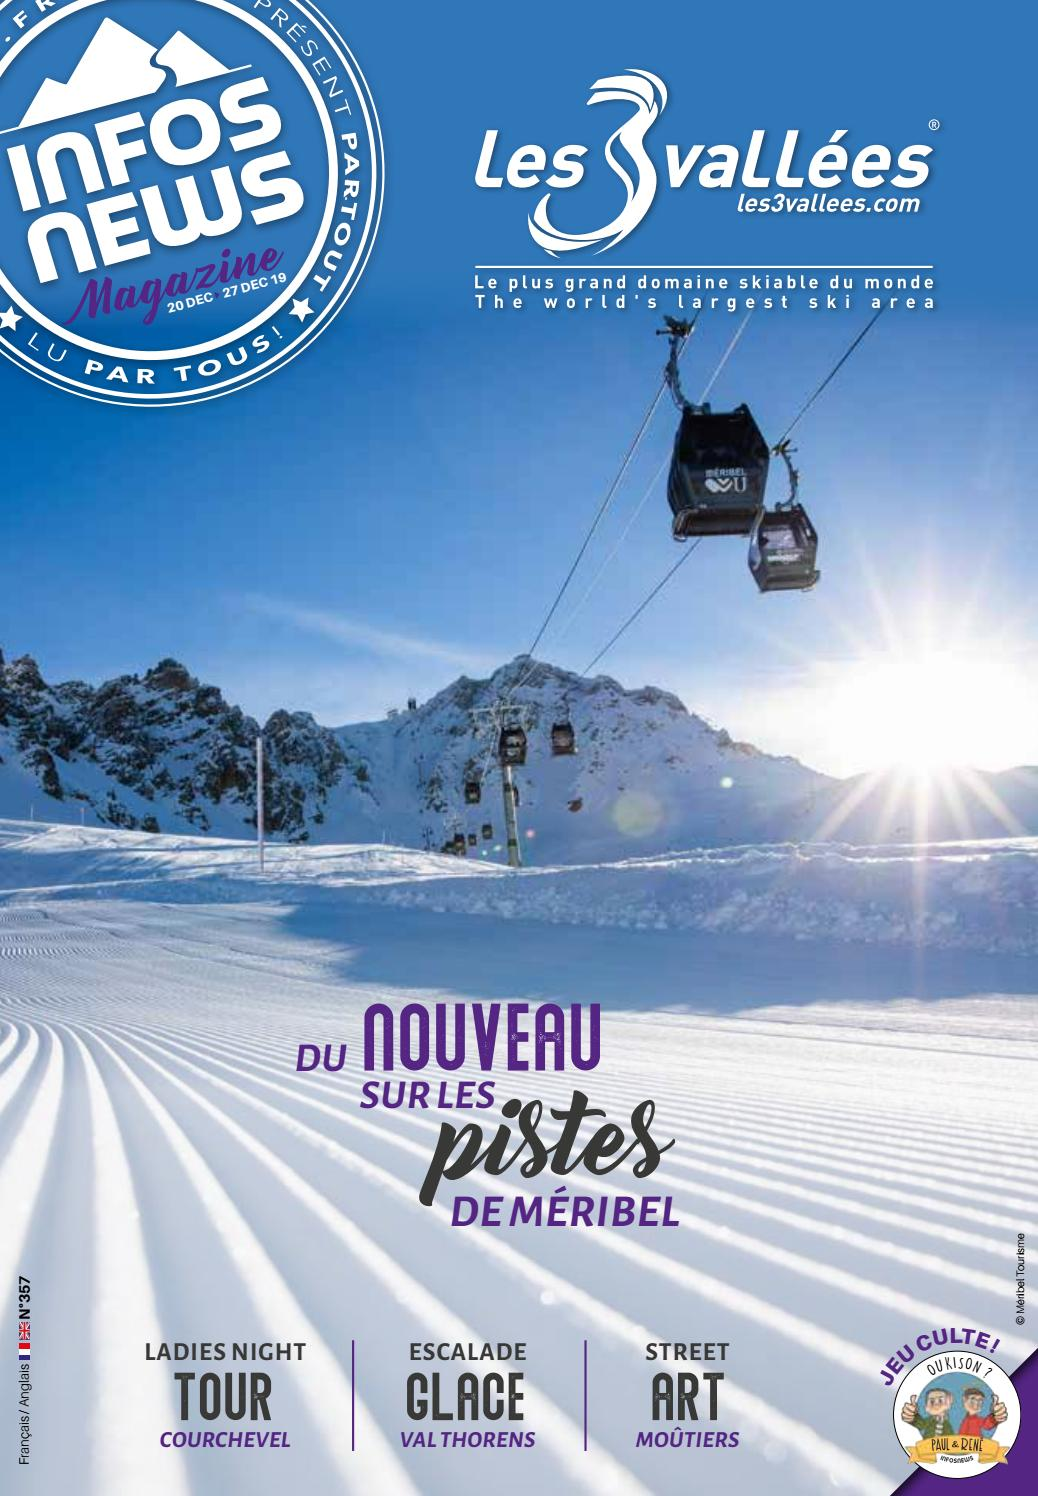 Les 3 Vallées Infosnews n°357 by Magazine INFOSNEWS issuu